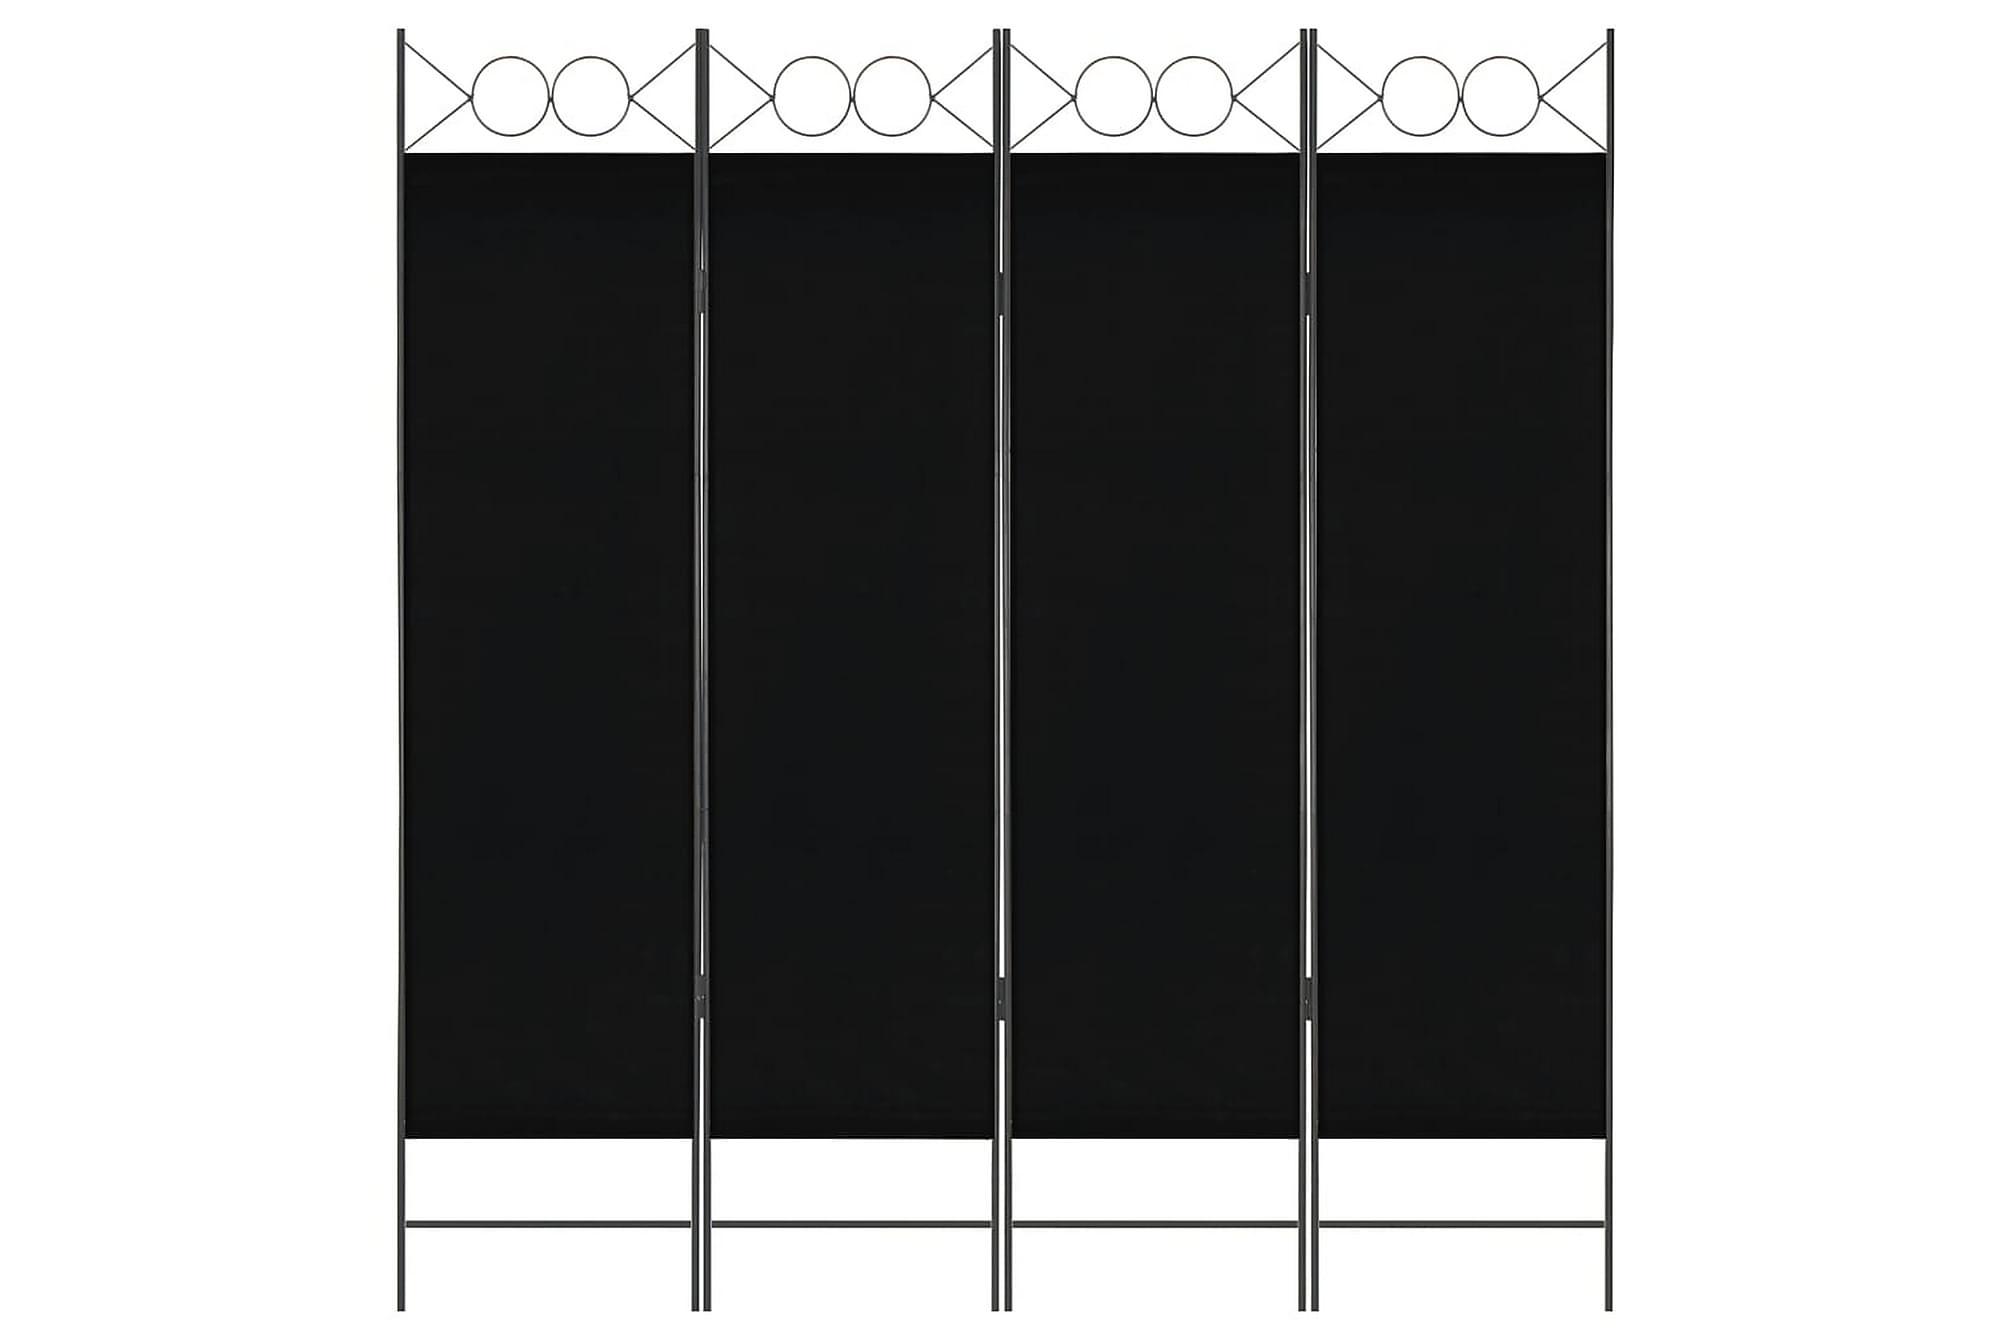 Rumsavdelare 4 paneler svart 160×180 cm